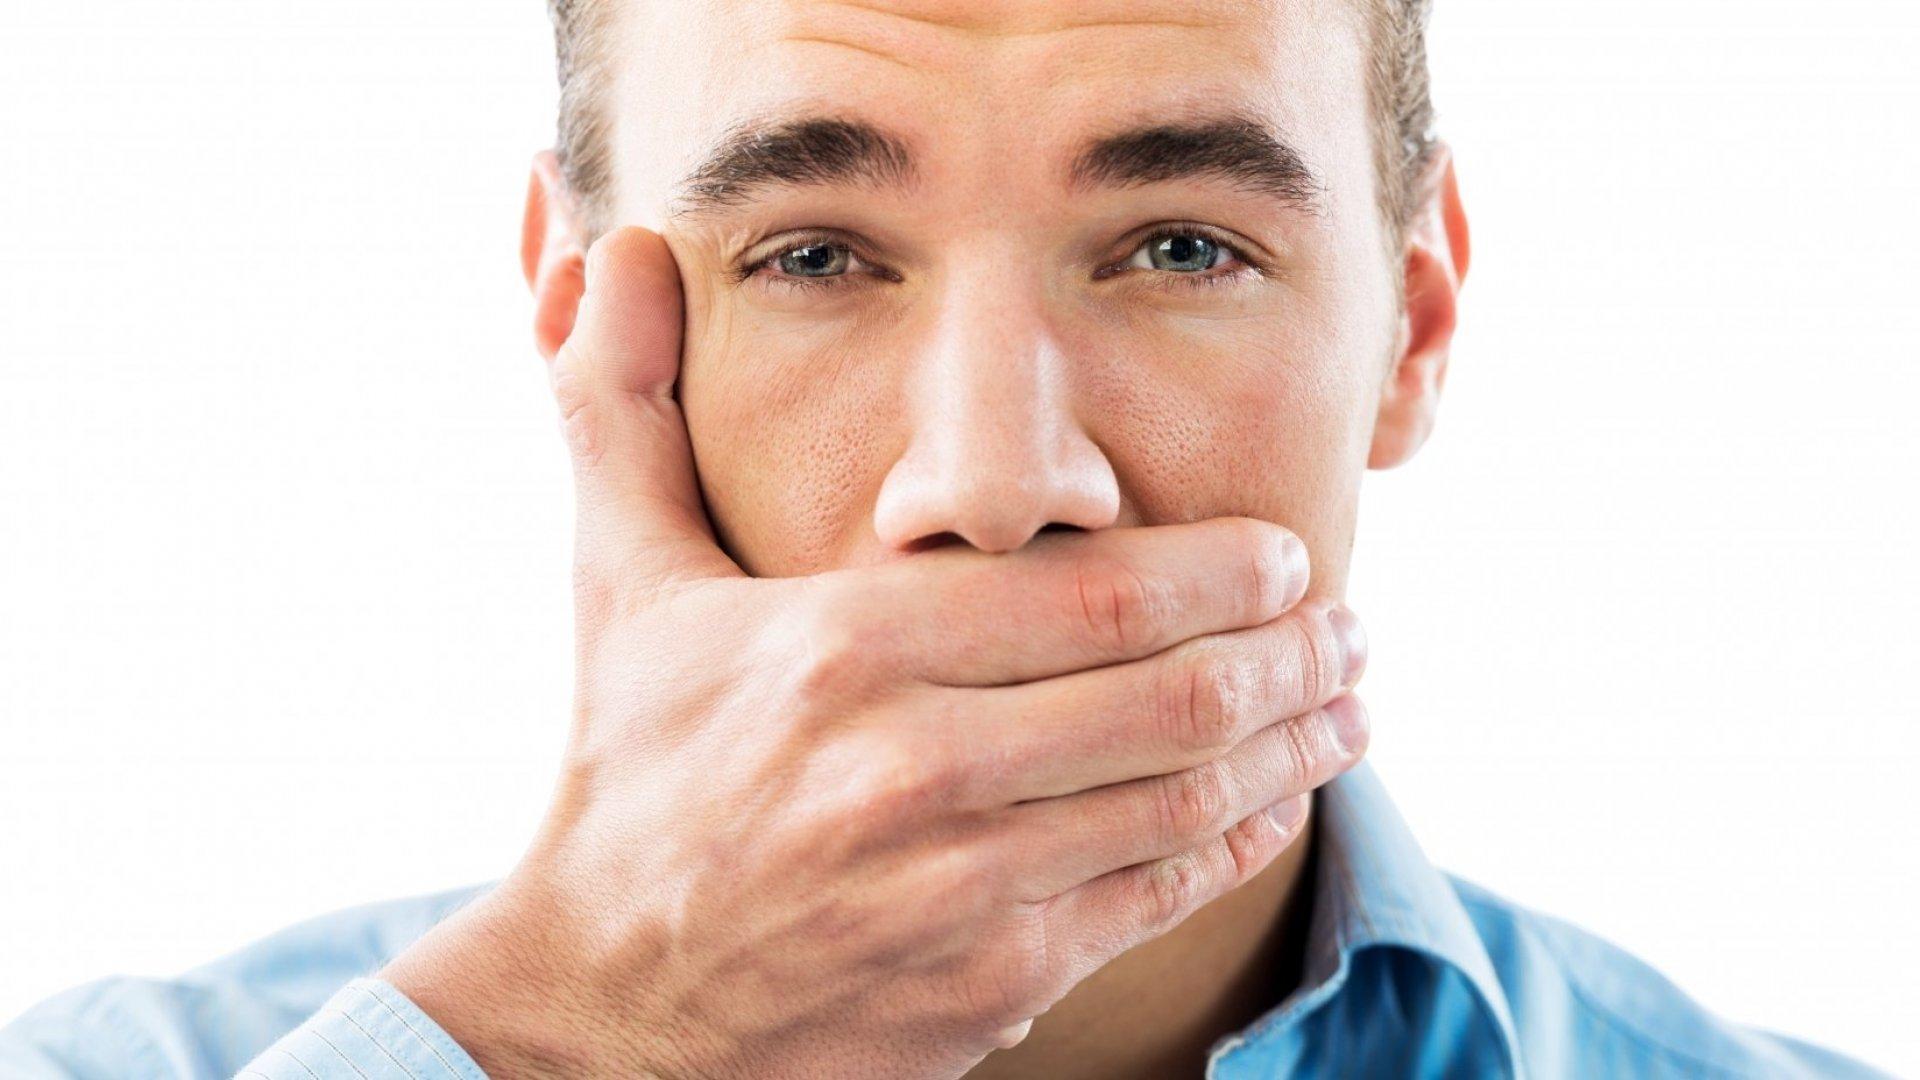 Why Silence at Work Can Sabotage Team Camaraderie